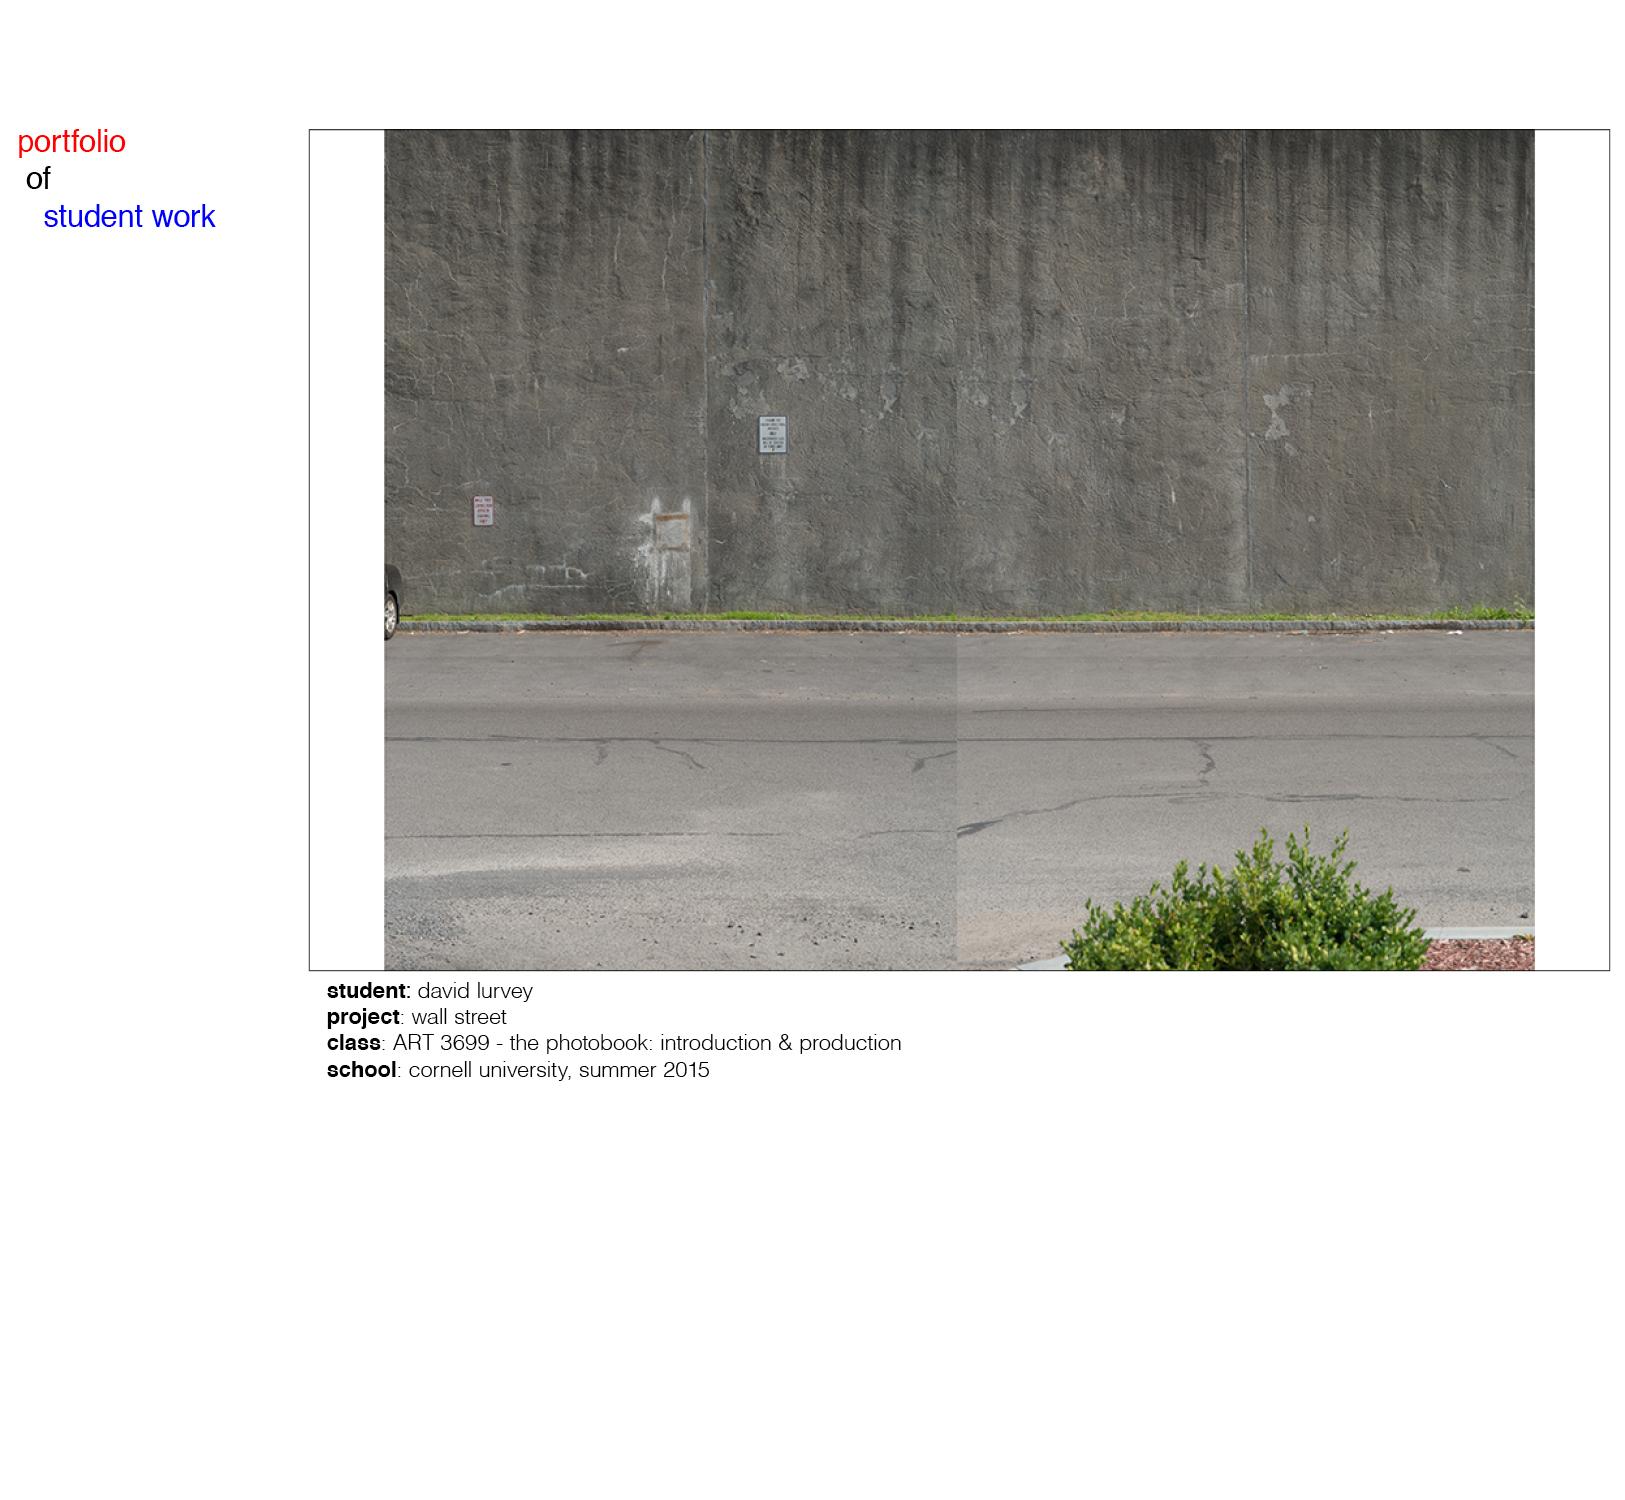 wall_street_003.jpg